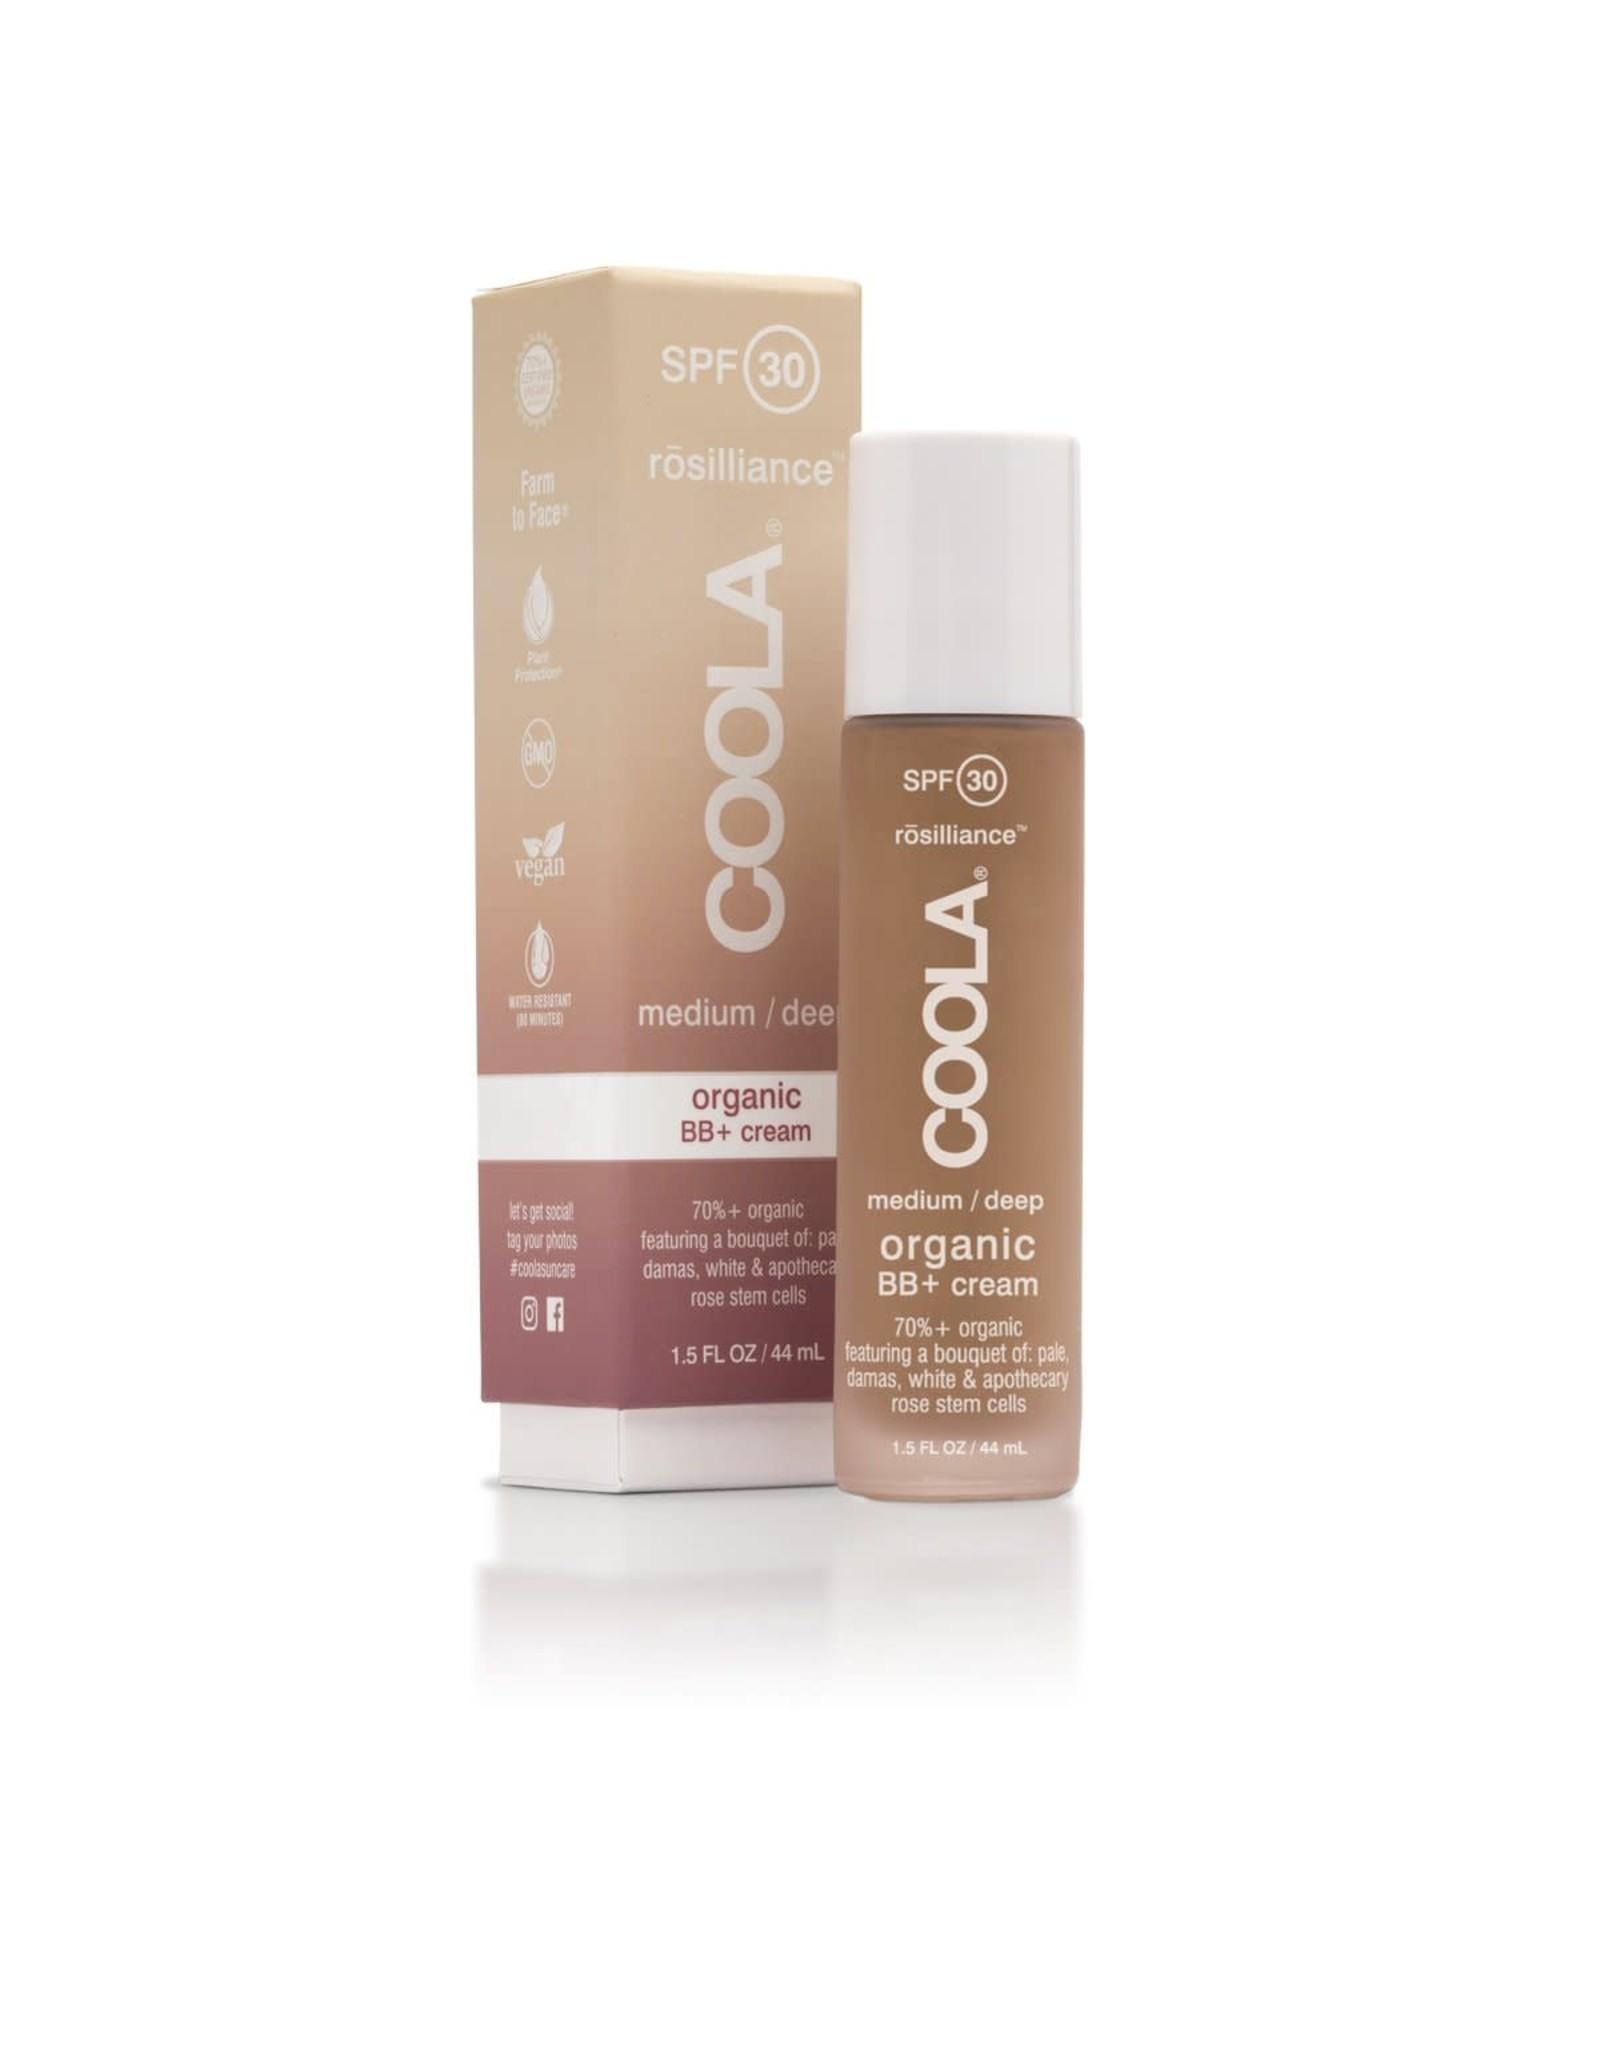 COOLA Medium/Deep BB+ Cream SPF30